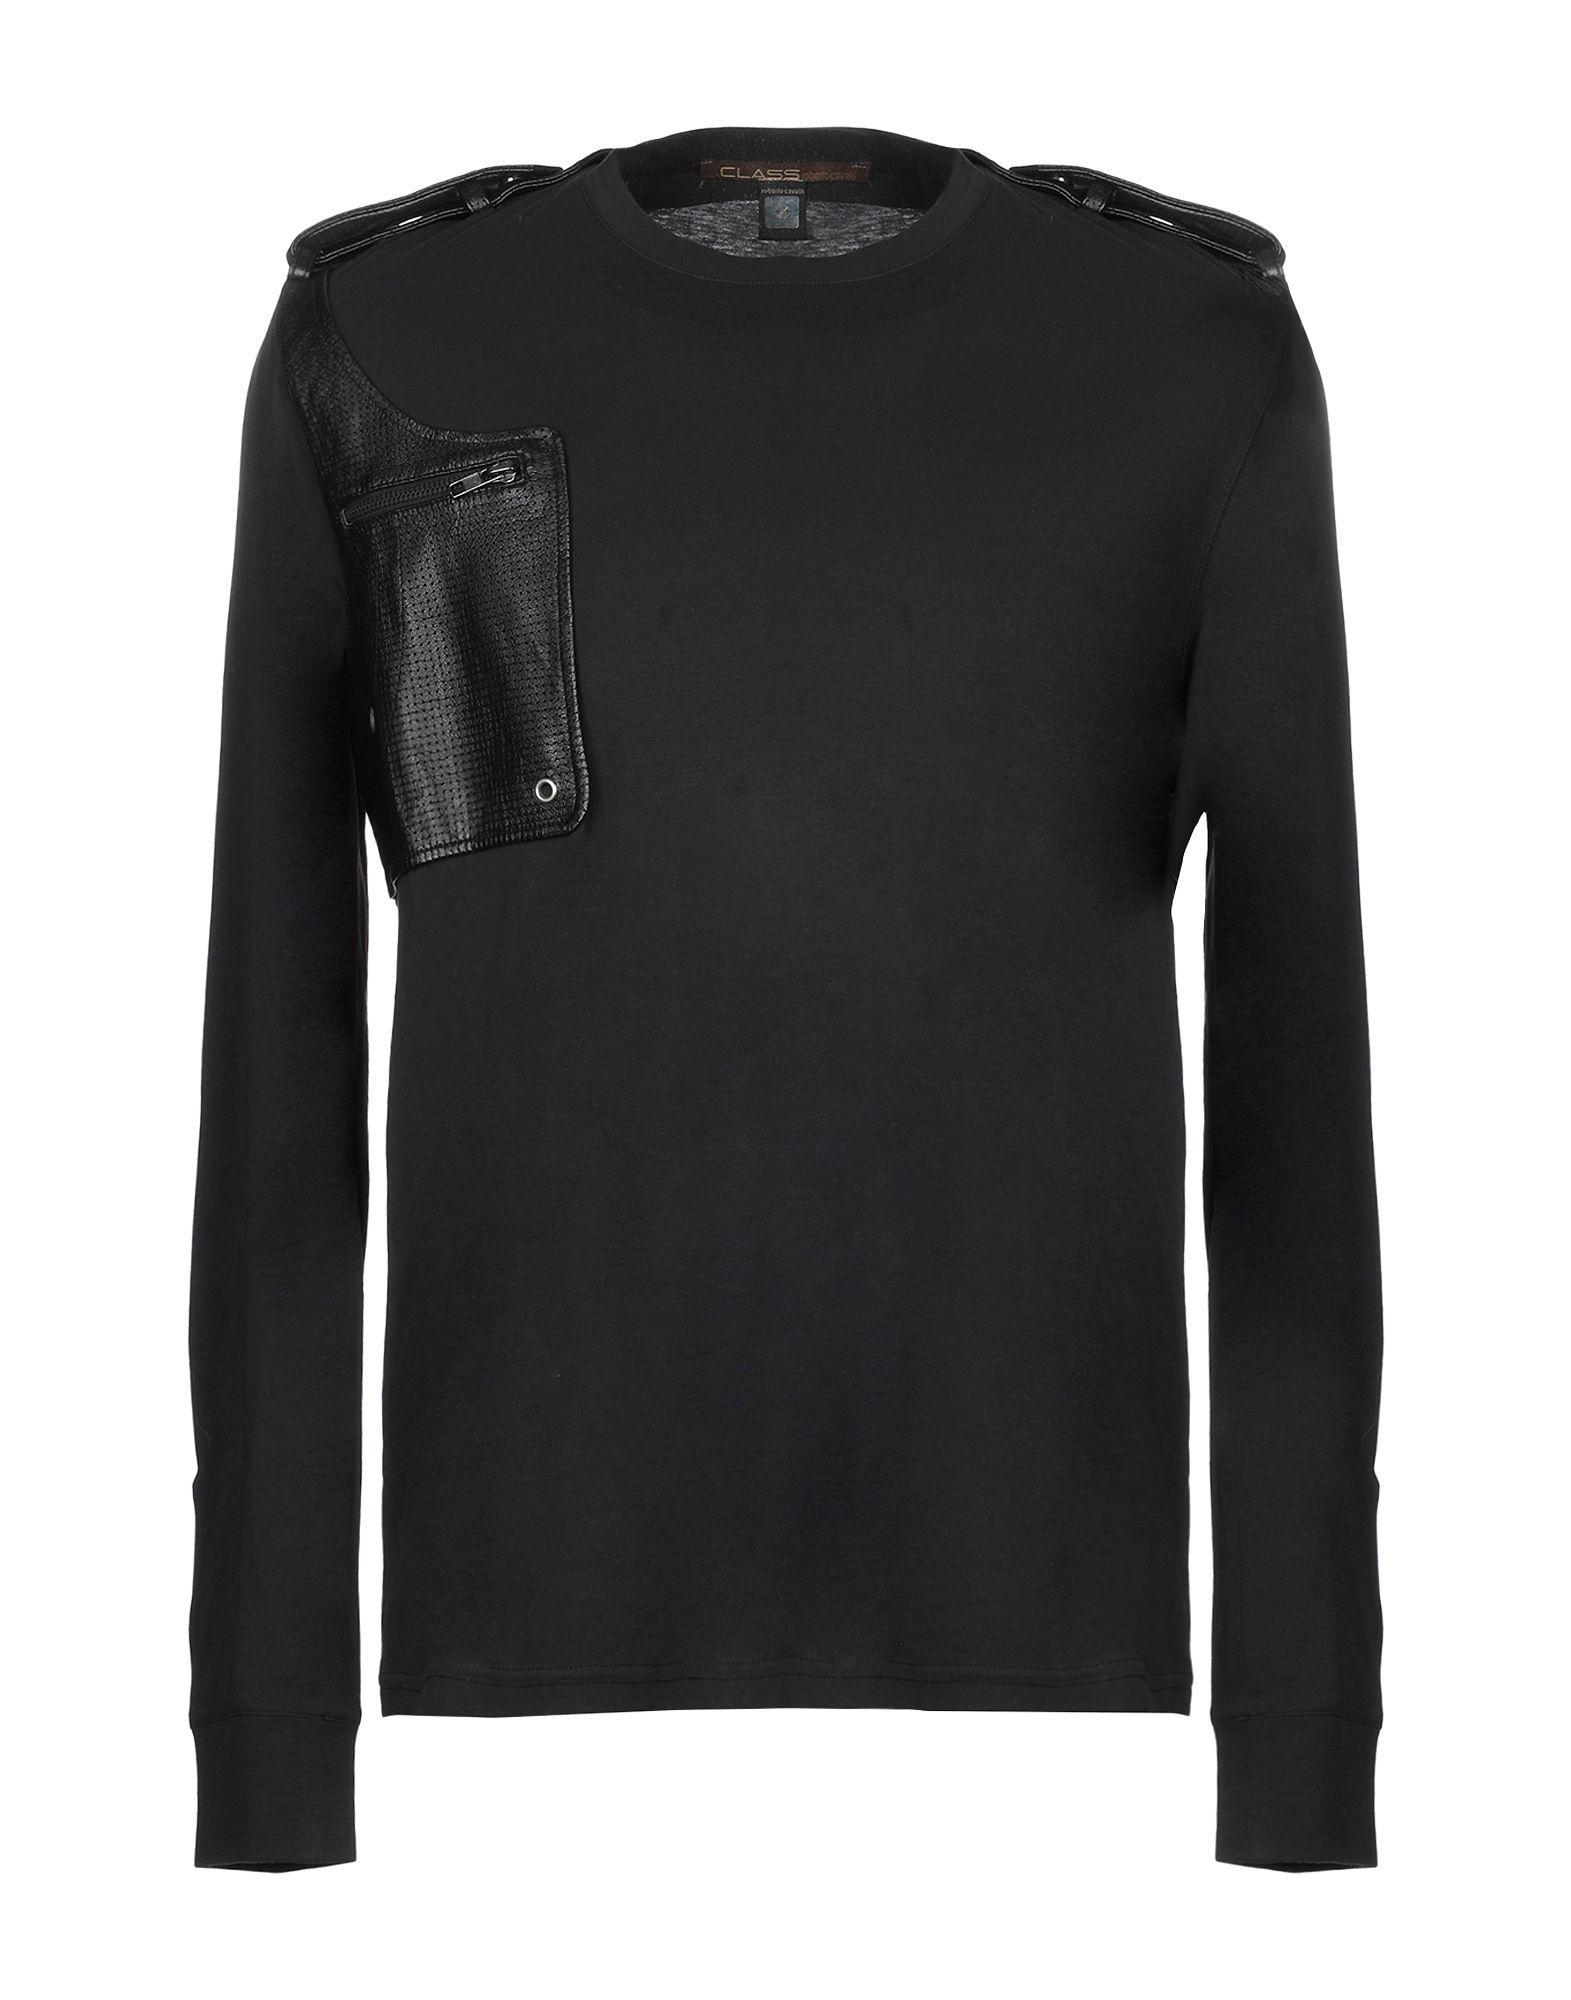 269868e3f Lyst - Class Roberto Cavalli T-shirt in Black for Men